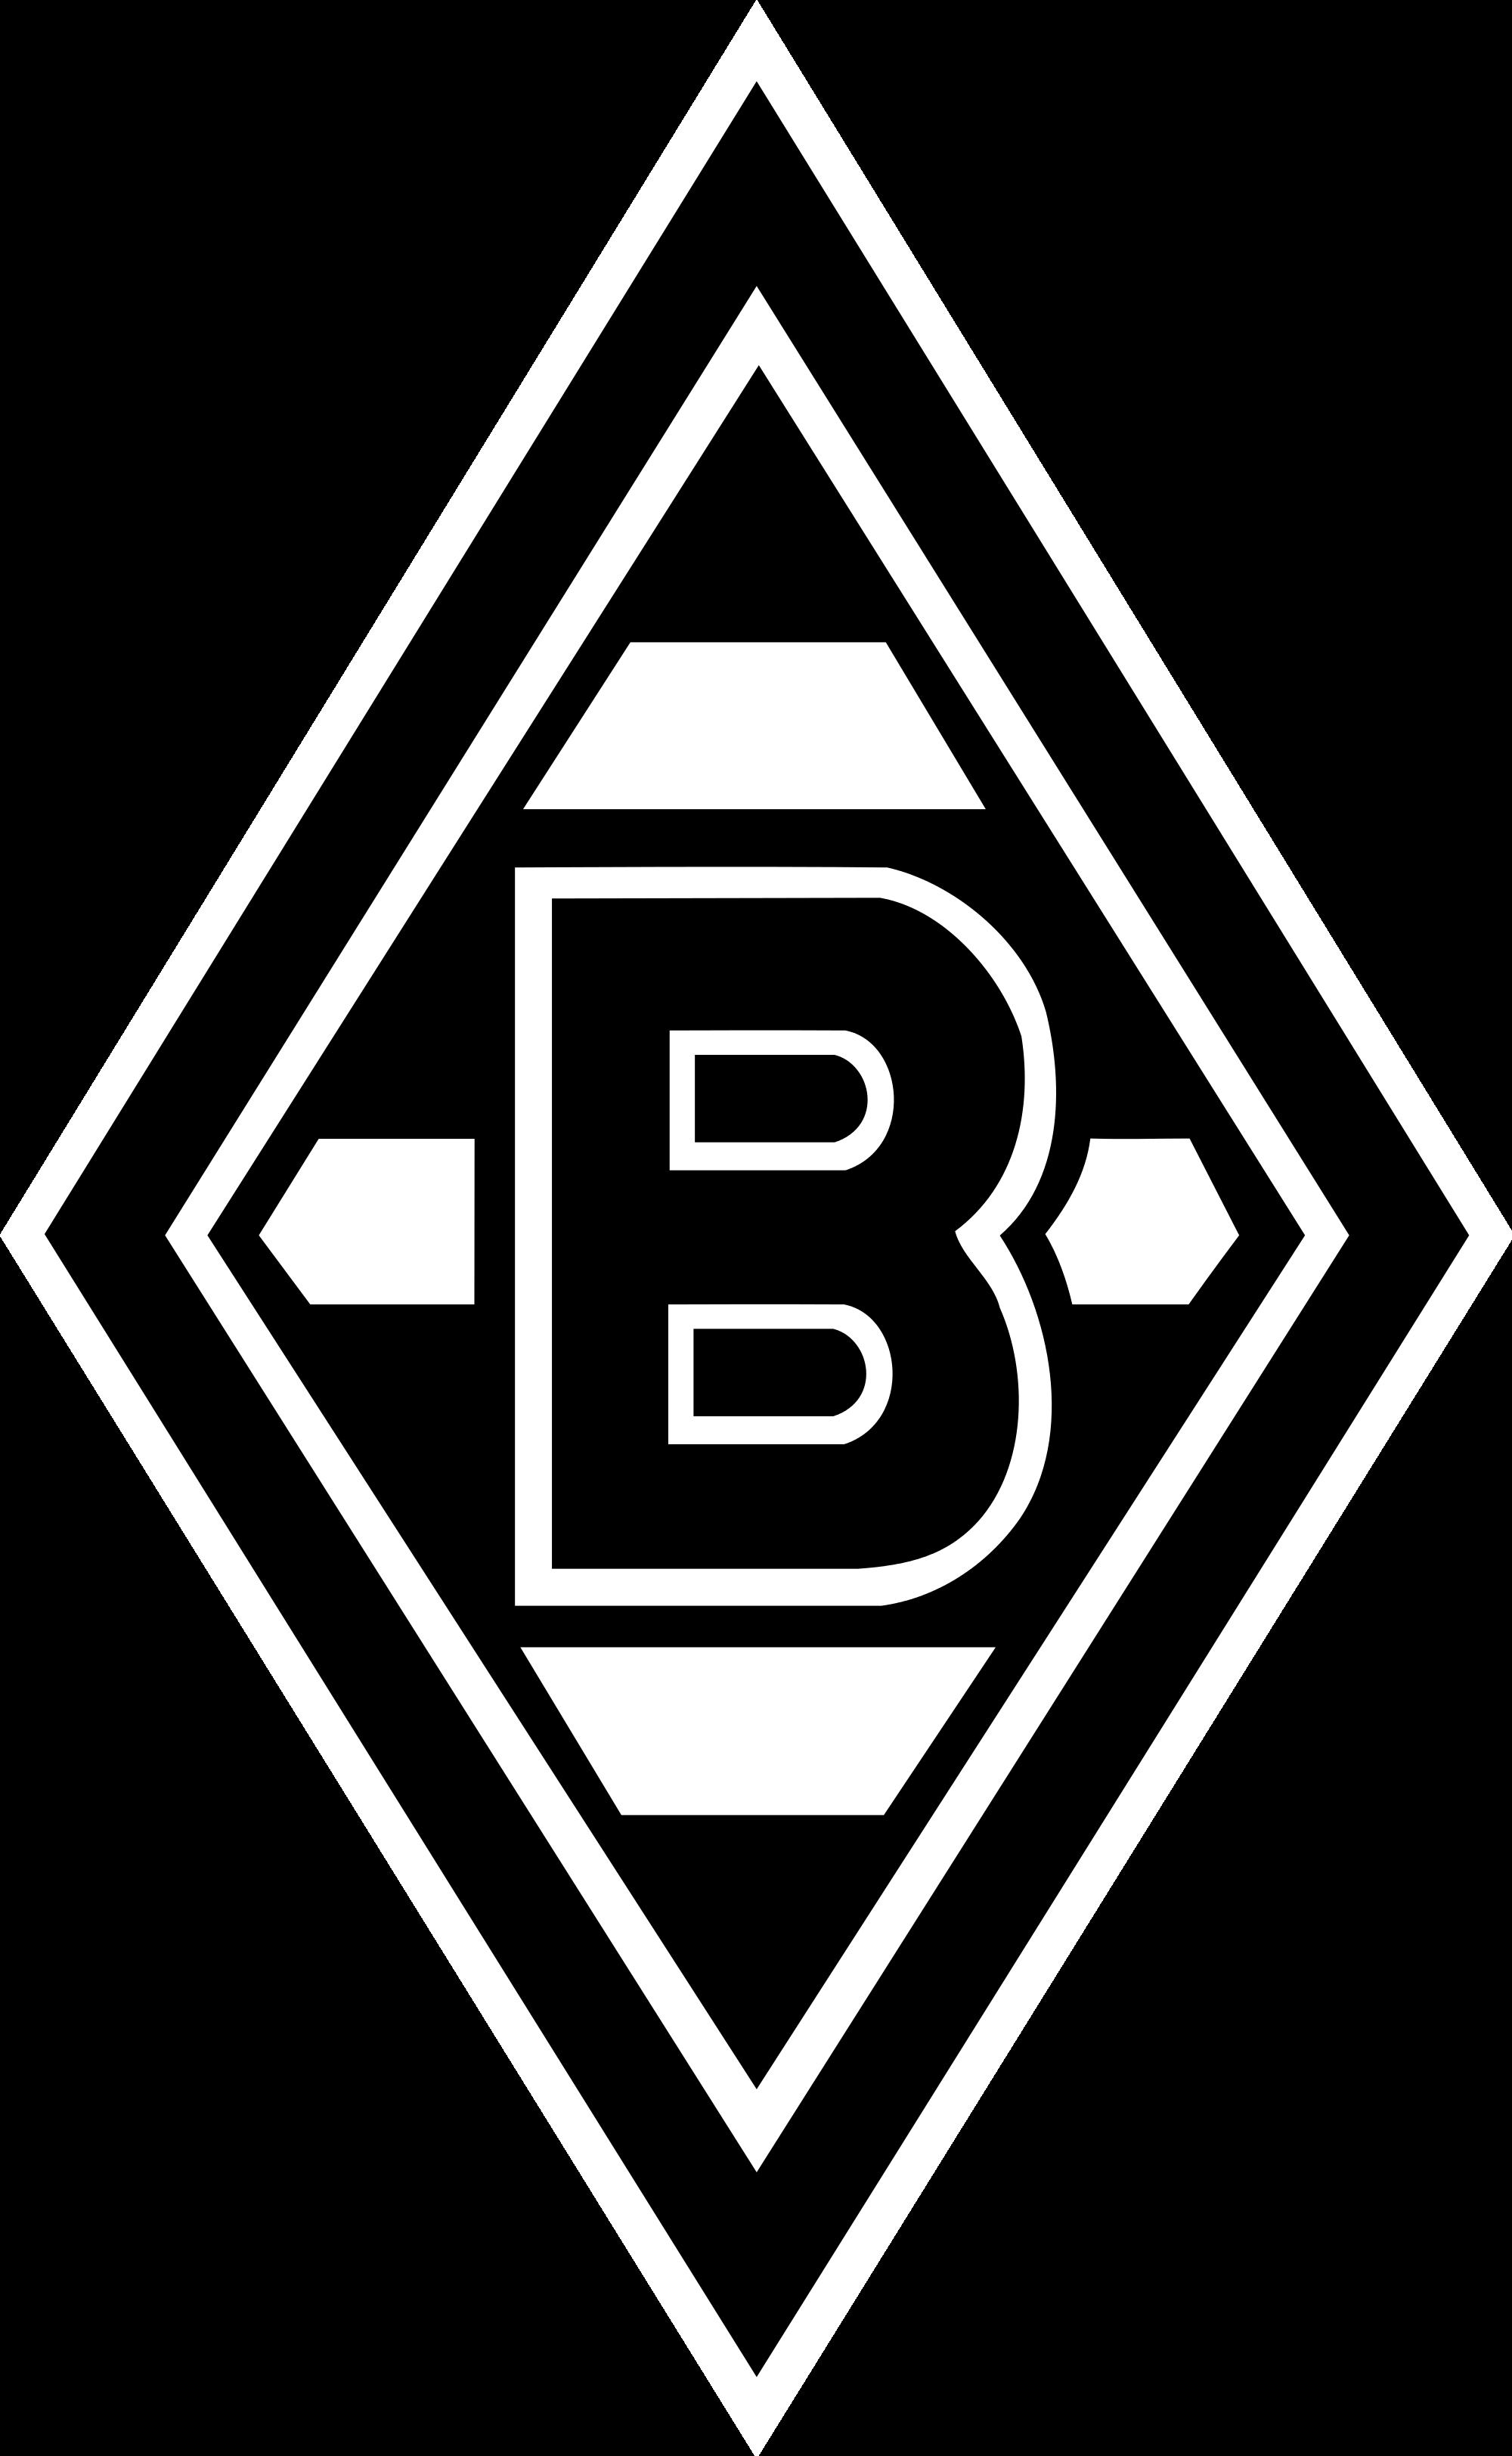 bundesliga logo png borussia borussia monchengladbach vs wolfsburg 2307001 vippng vippng